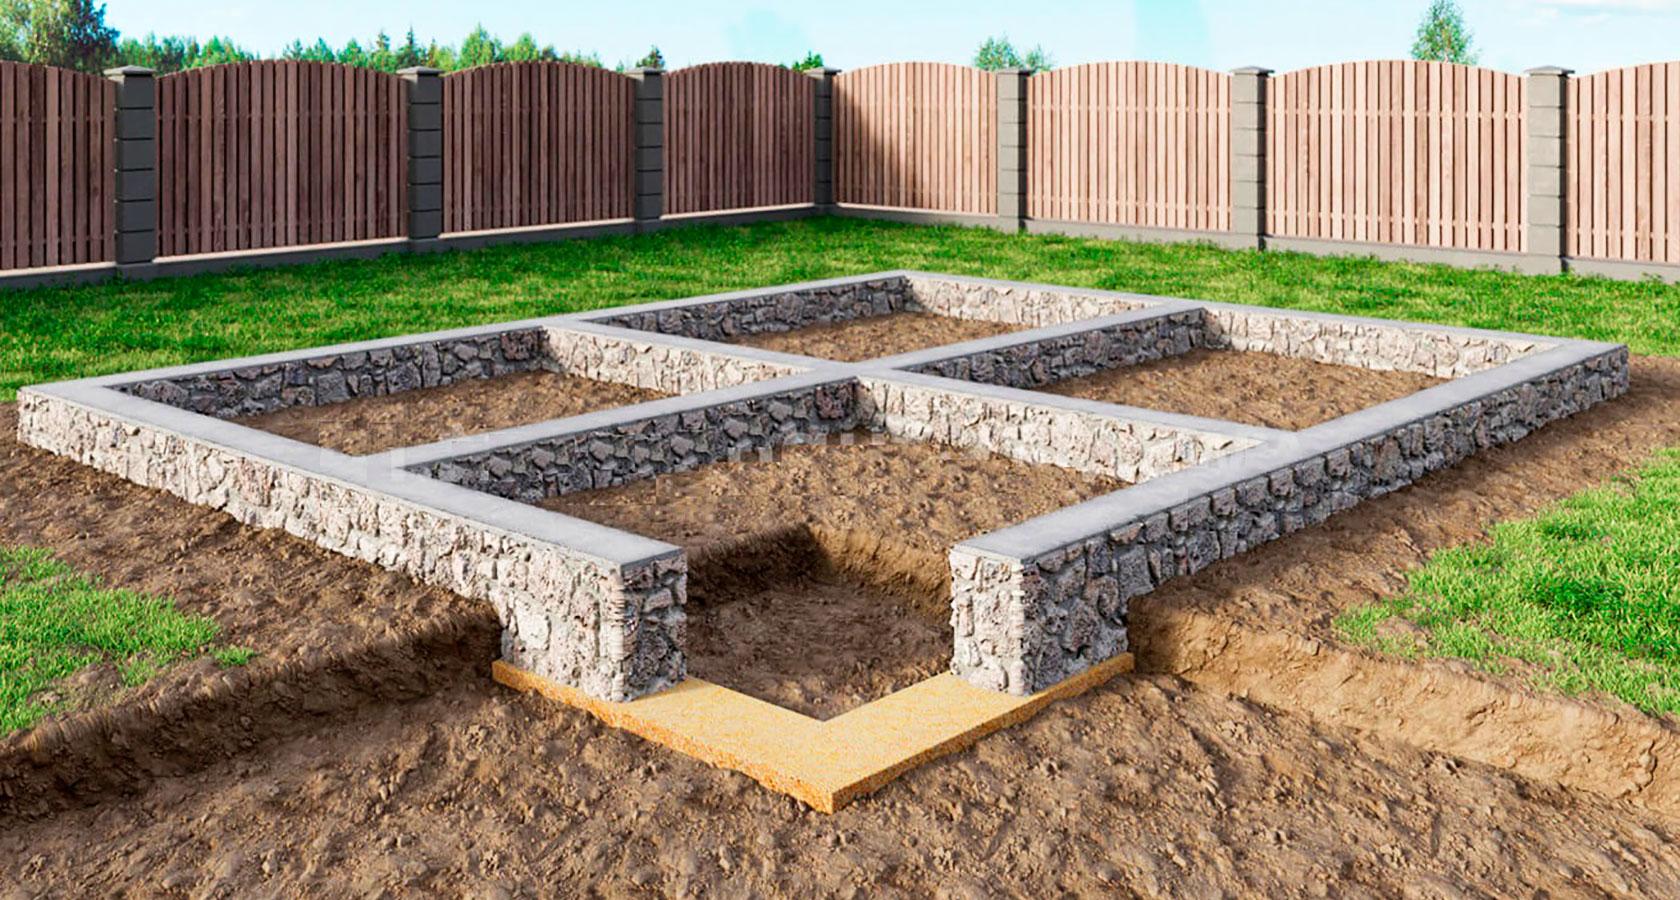 Фундаментные работы, монтаж блоков ФСБ, заливка плиты фундамента